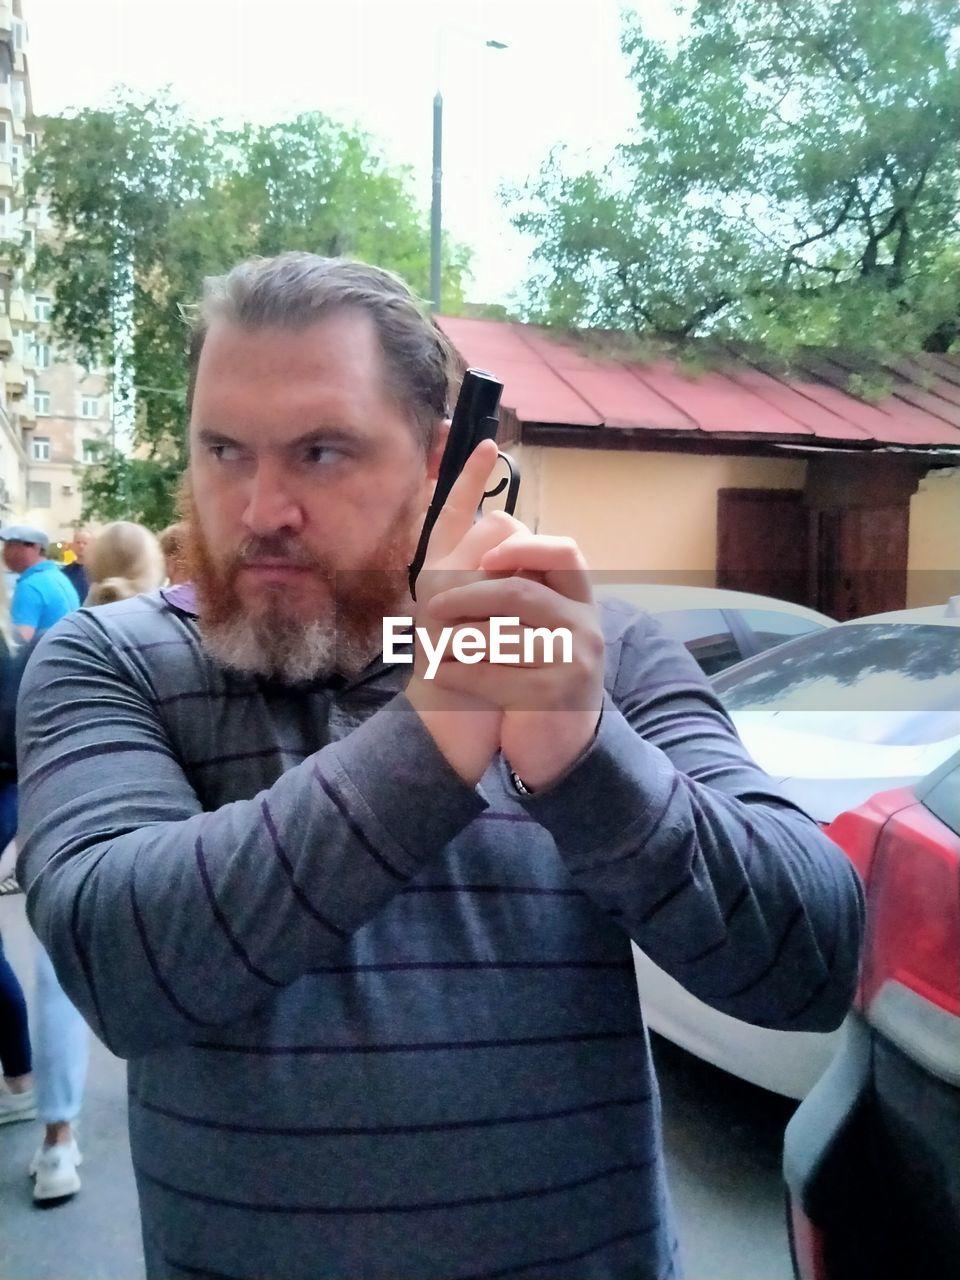 PORTRAIT OF MAN USING SMART PHONE IN WINTER